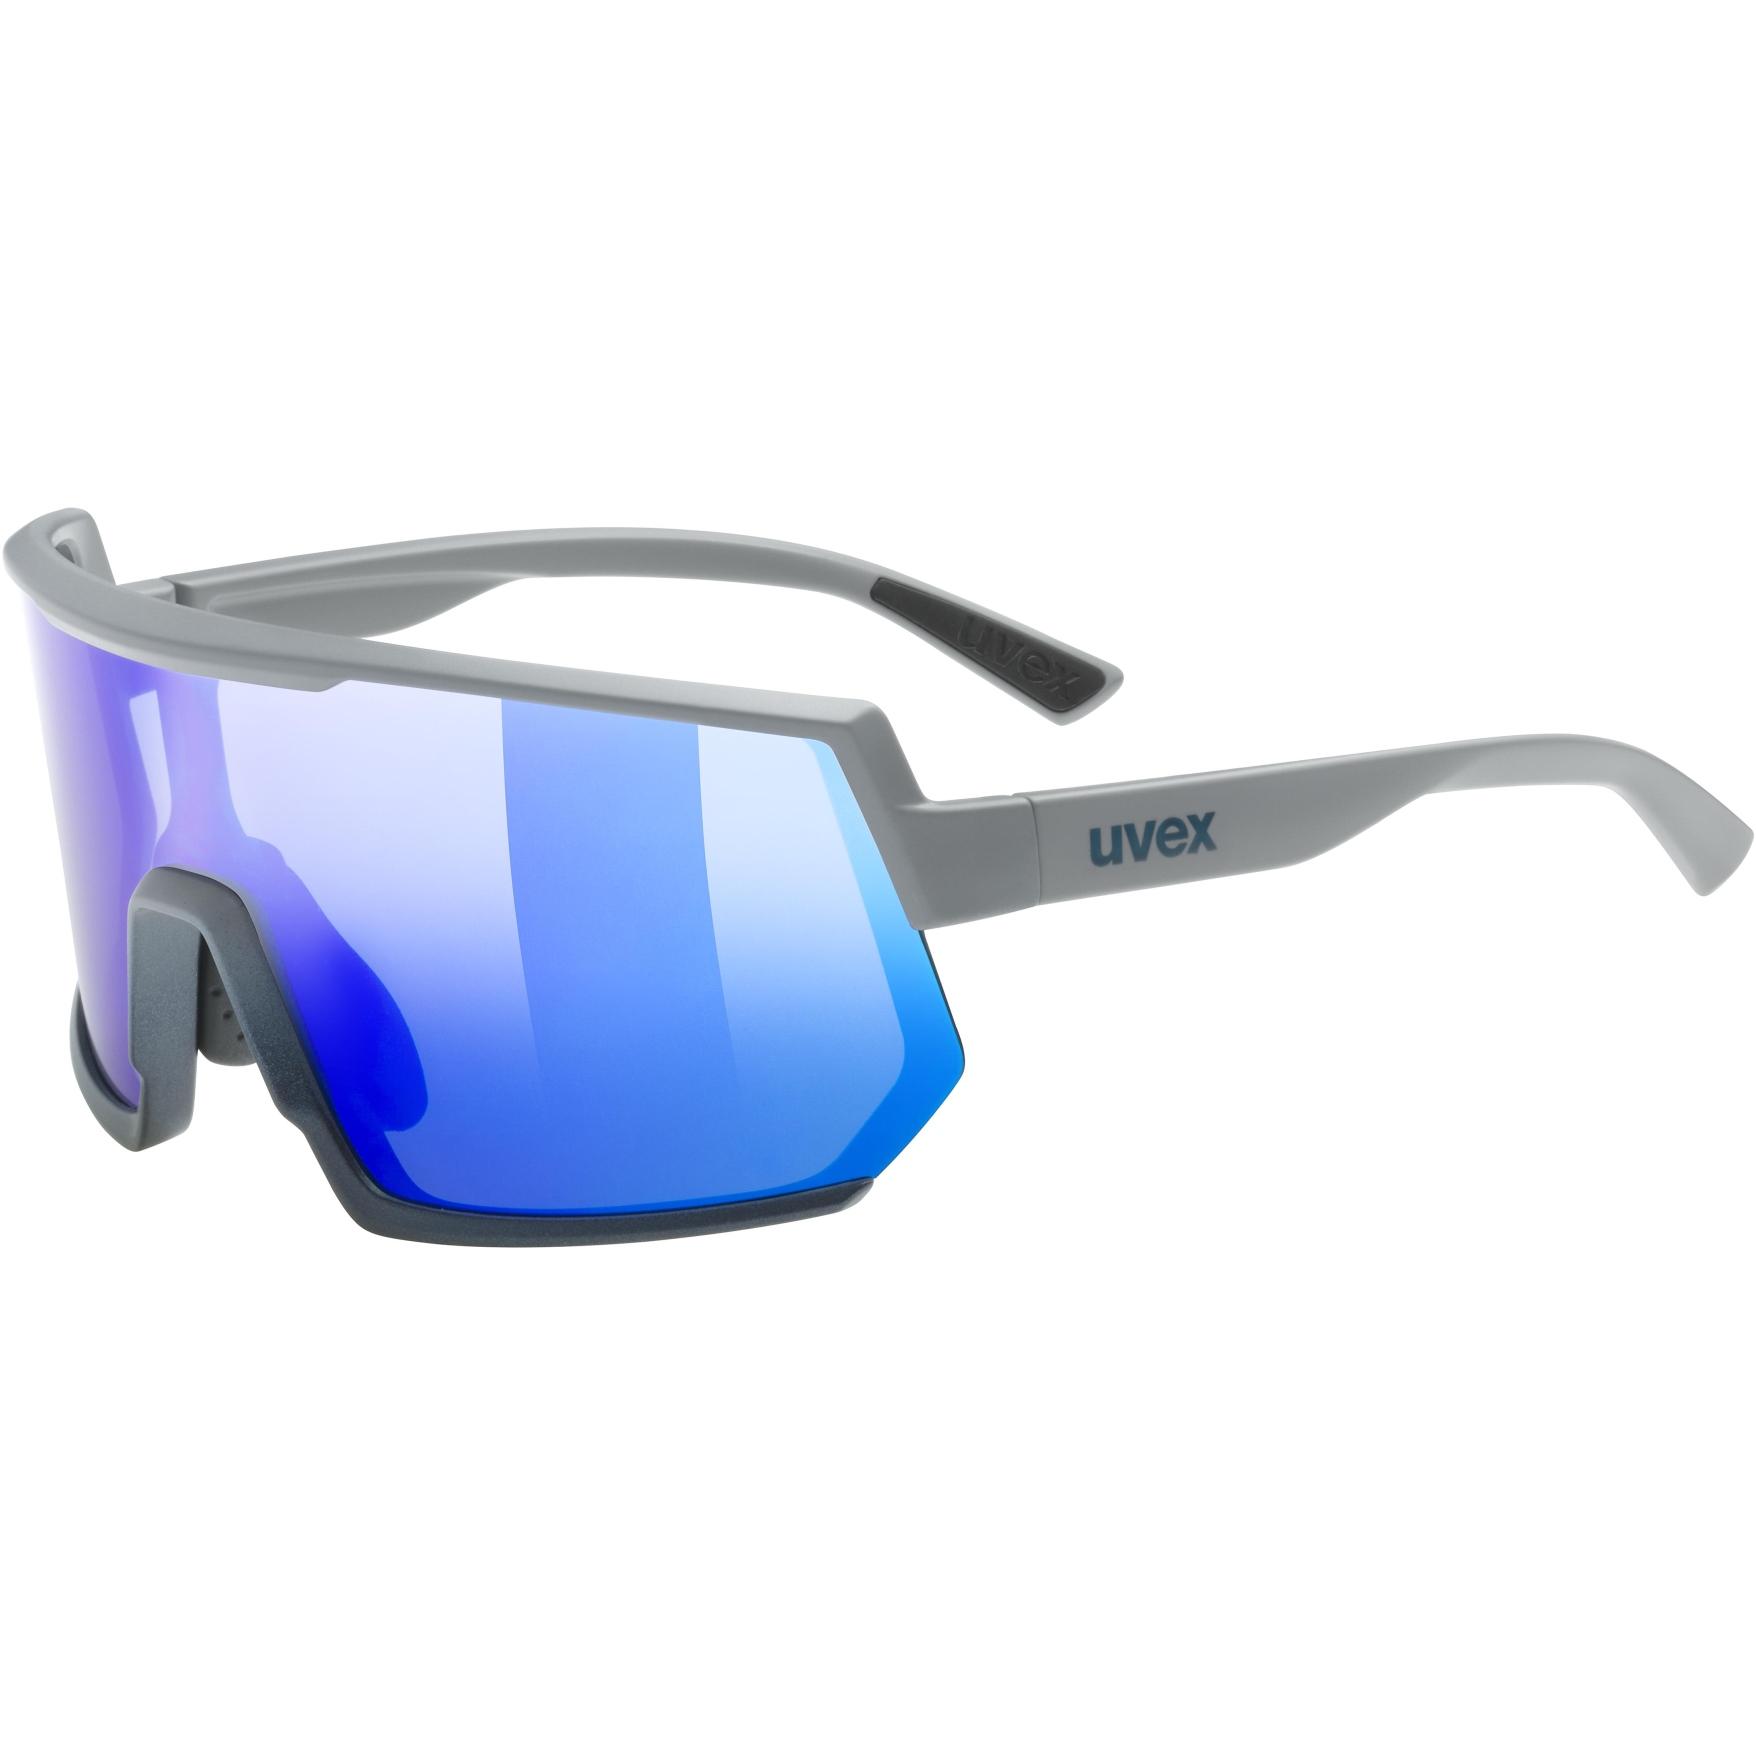 Uvex sportstyle 235 Brille - rhino deep space mat/mirror blue